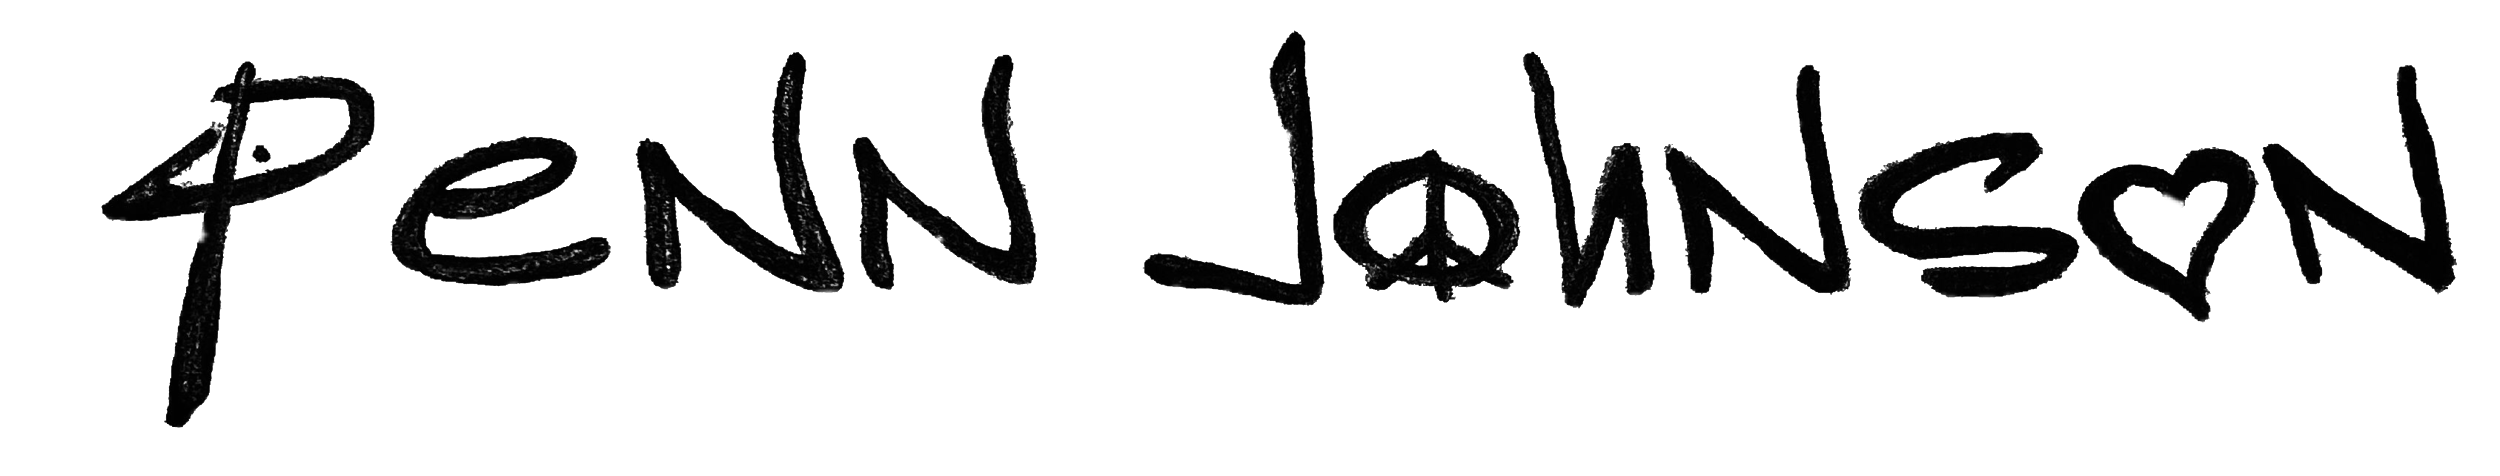 PJ Black Letters Only.PNG